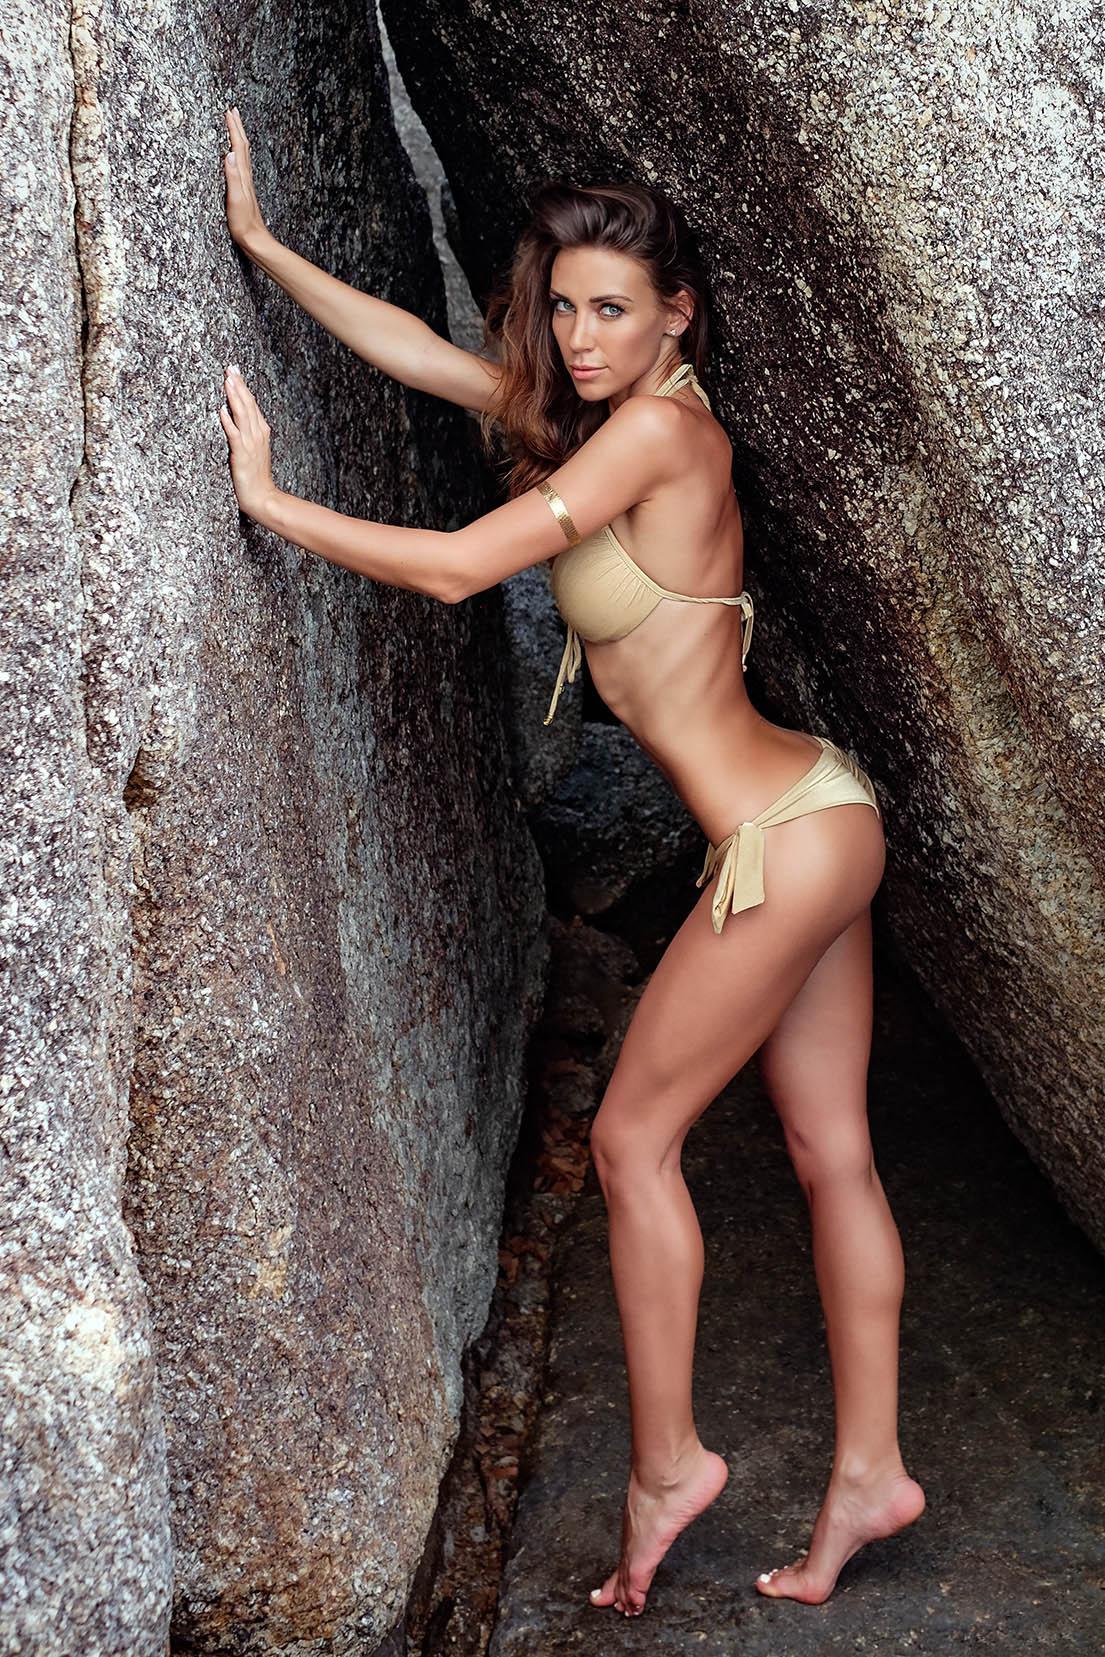 Maria Mezentseva nudes (23 pictures), pics Paparazzi, Twitter, lingerie 2018